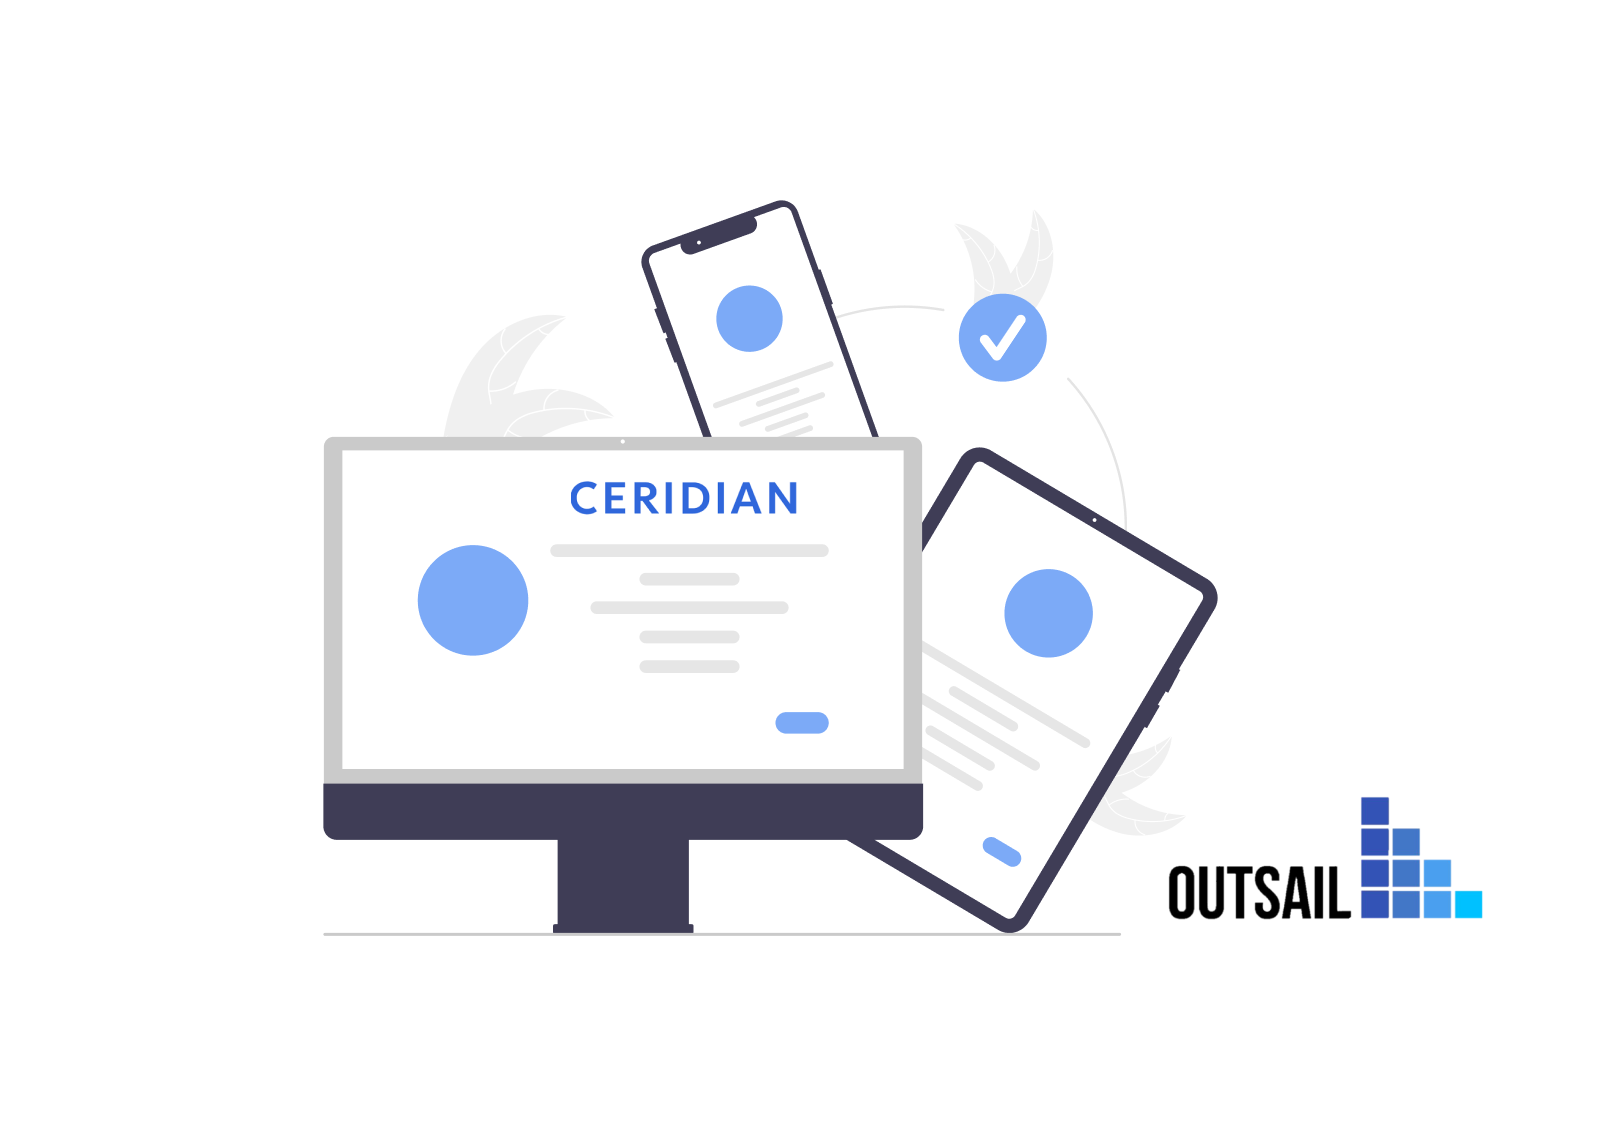 Ceridian Reviews - Pricing, Pros/Cons, User Reviews